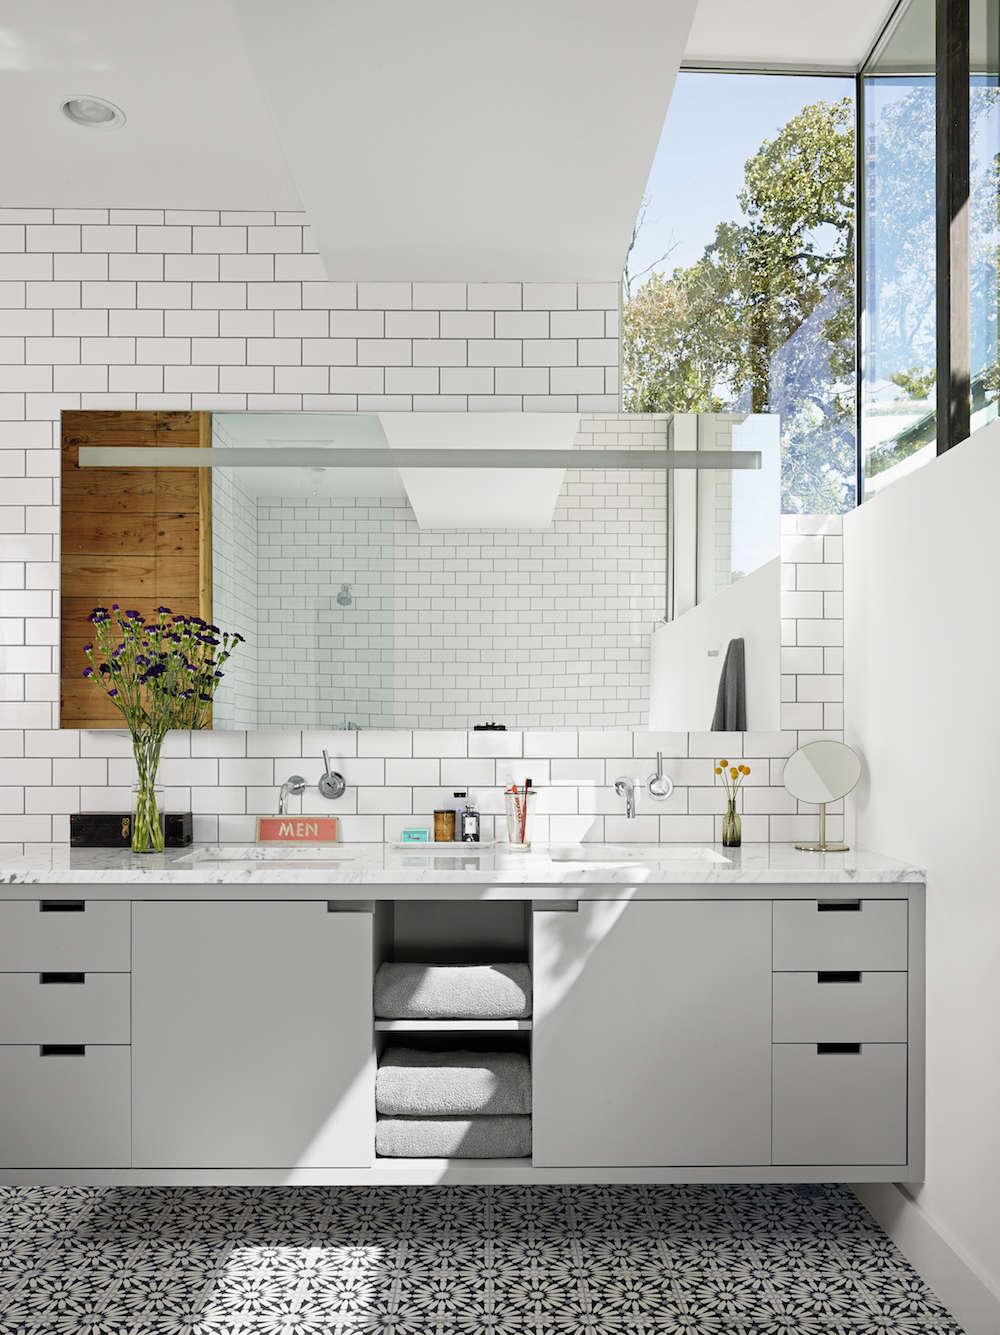 Hugh-Jefferson-Randolph-Bathroom-Grout-Tile-Remodelista-1